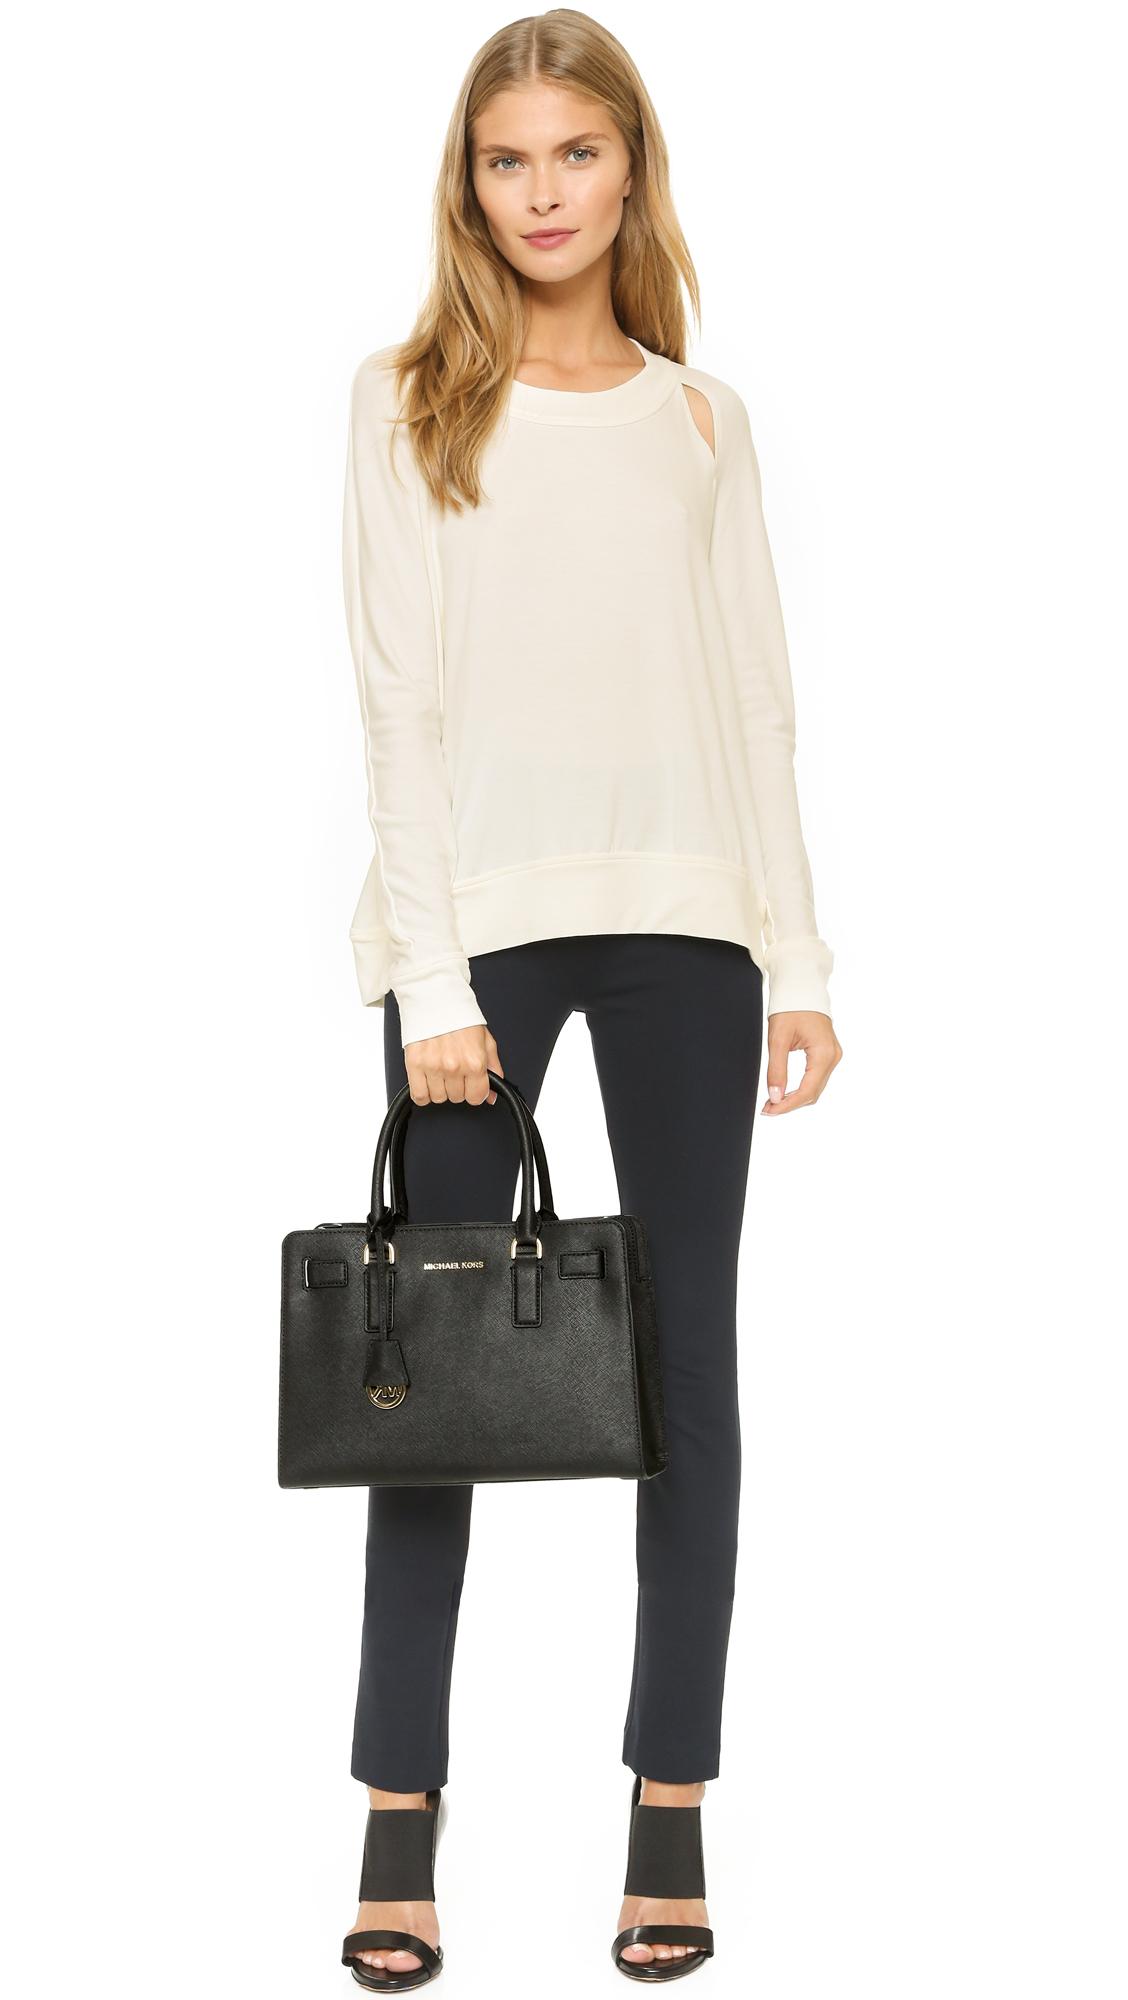 598d74442de268 greece handtasche michael kors dillon tz ew satchel black 52809 44ecb;  netherlands michael michael kors dillon satchel shopbop 61030 f7672